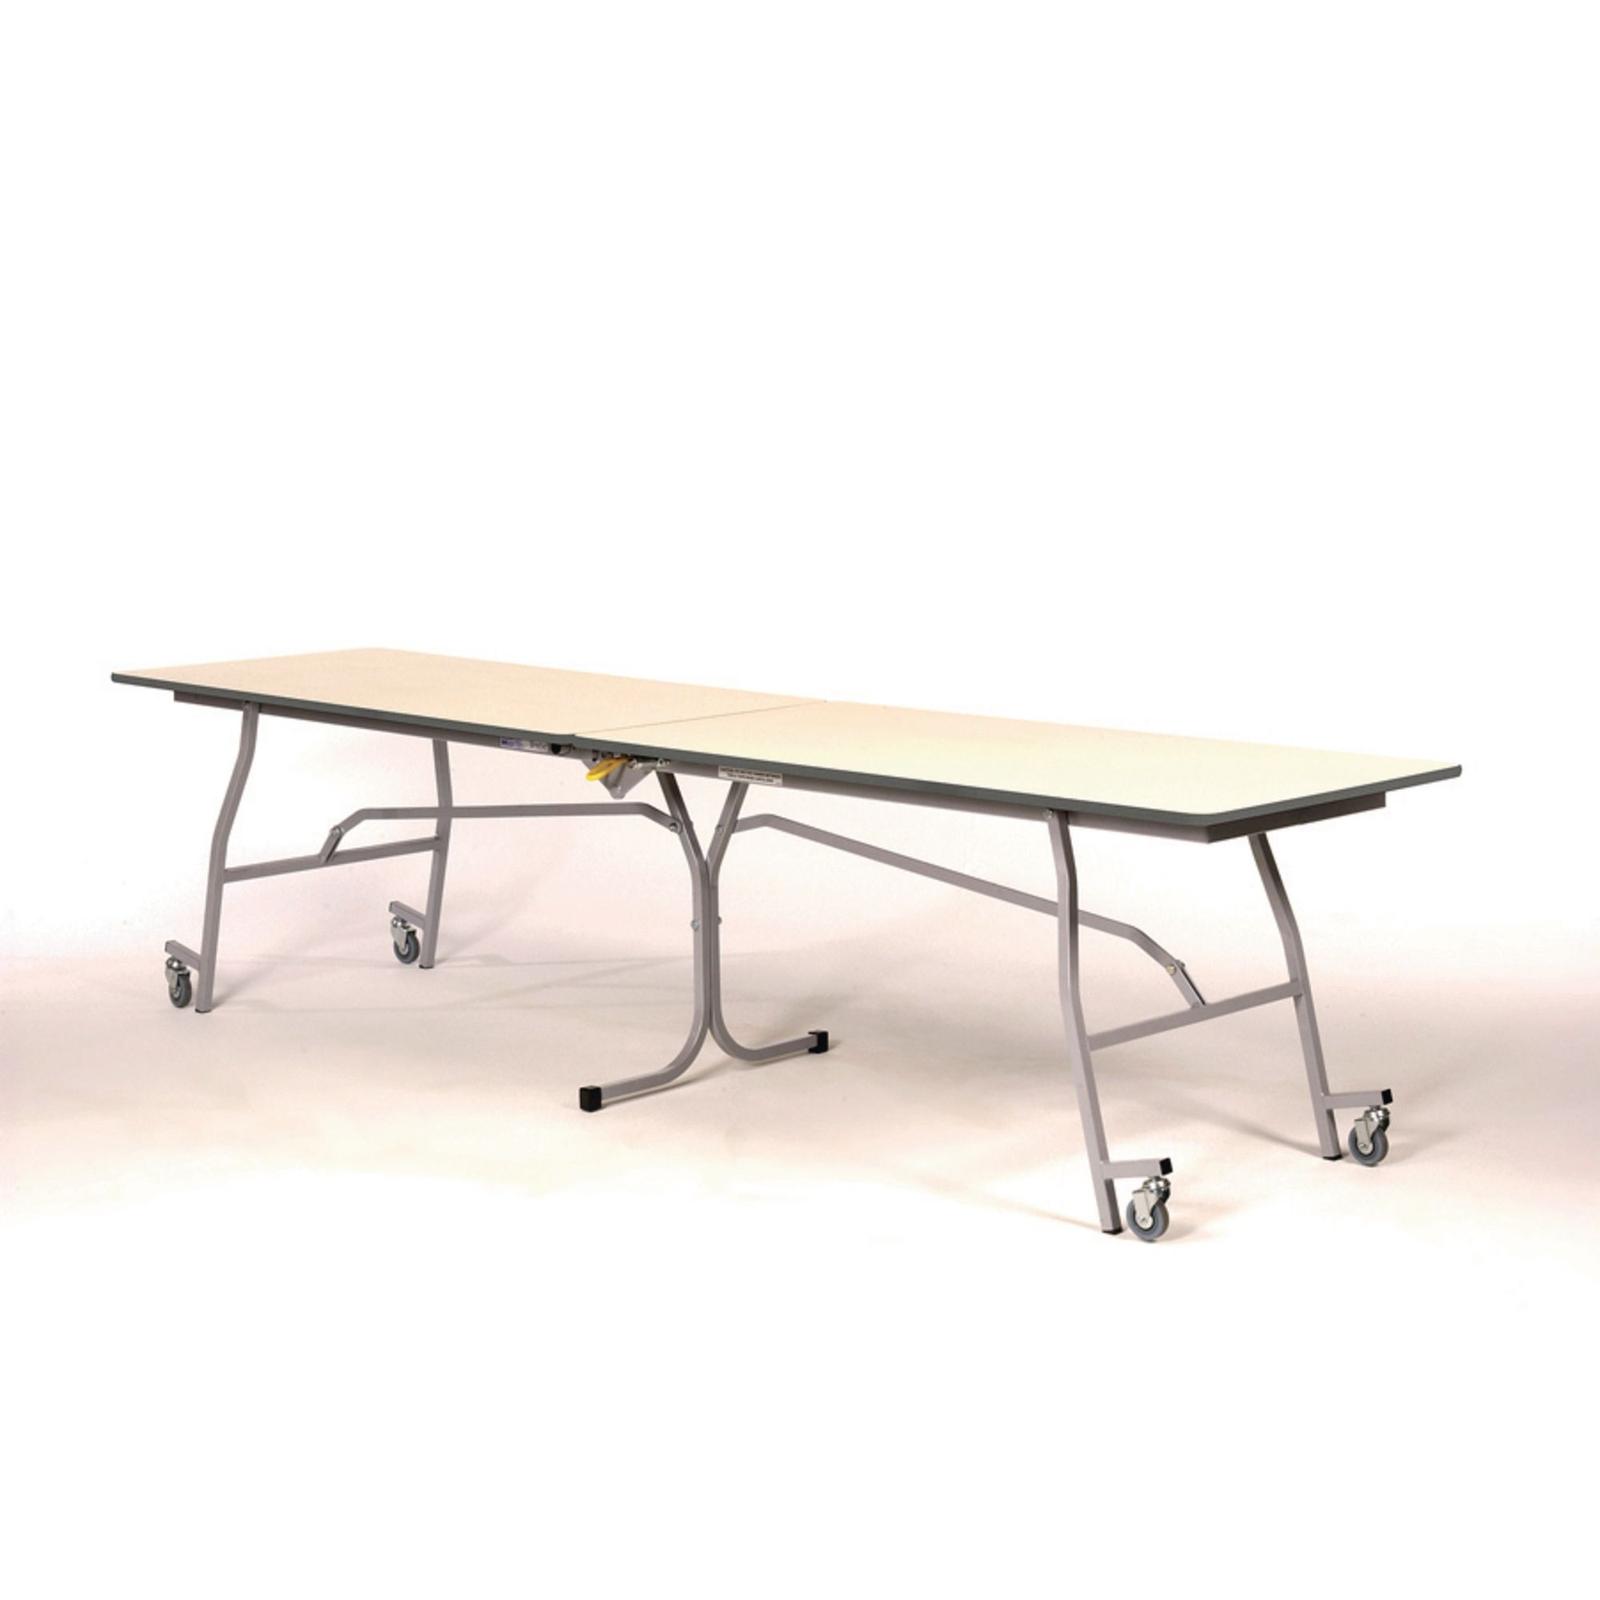 Lb Table 2440x750x690mm White